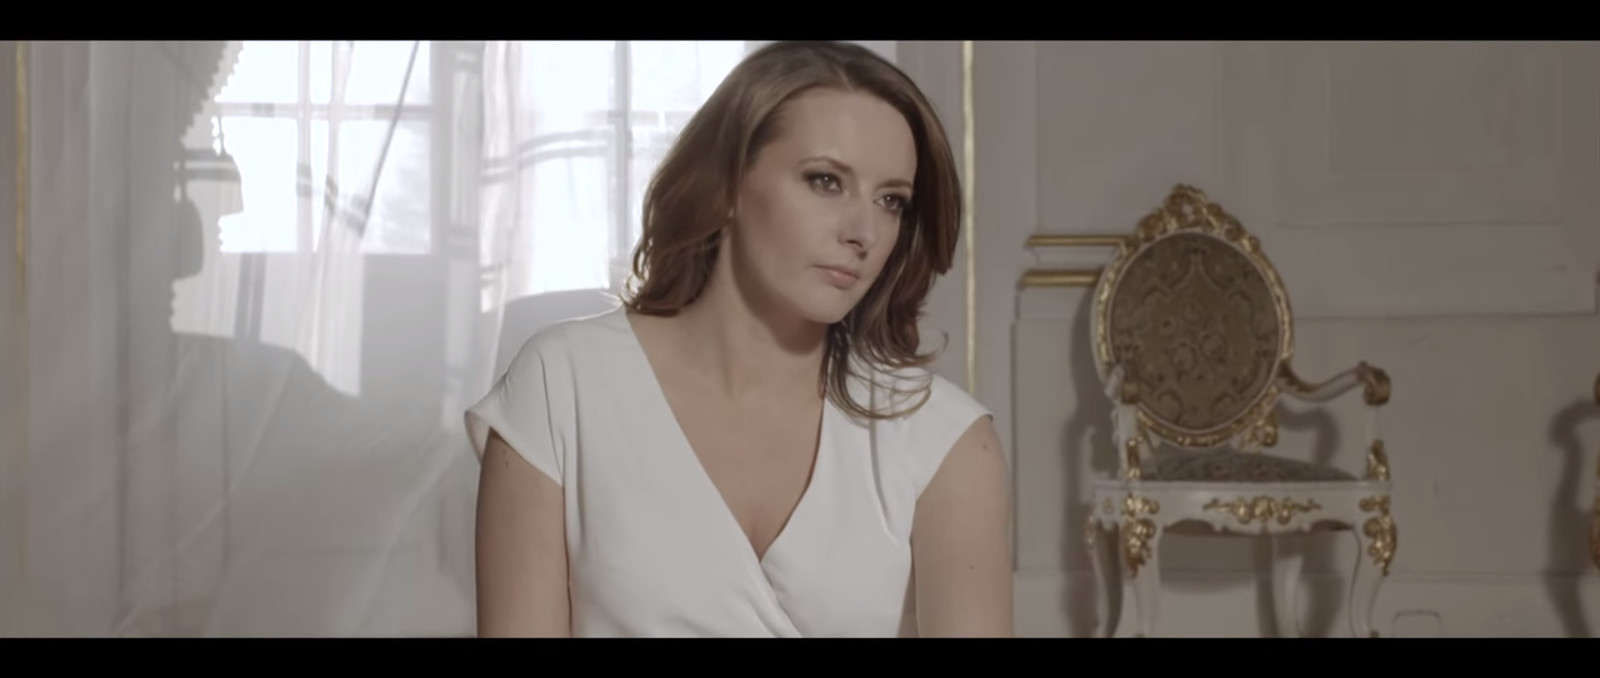 Monika Kuszyńska - In the name of Love